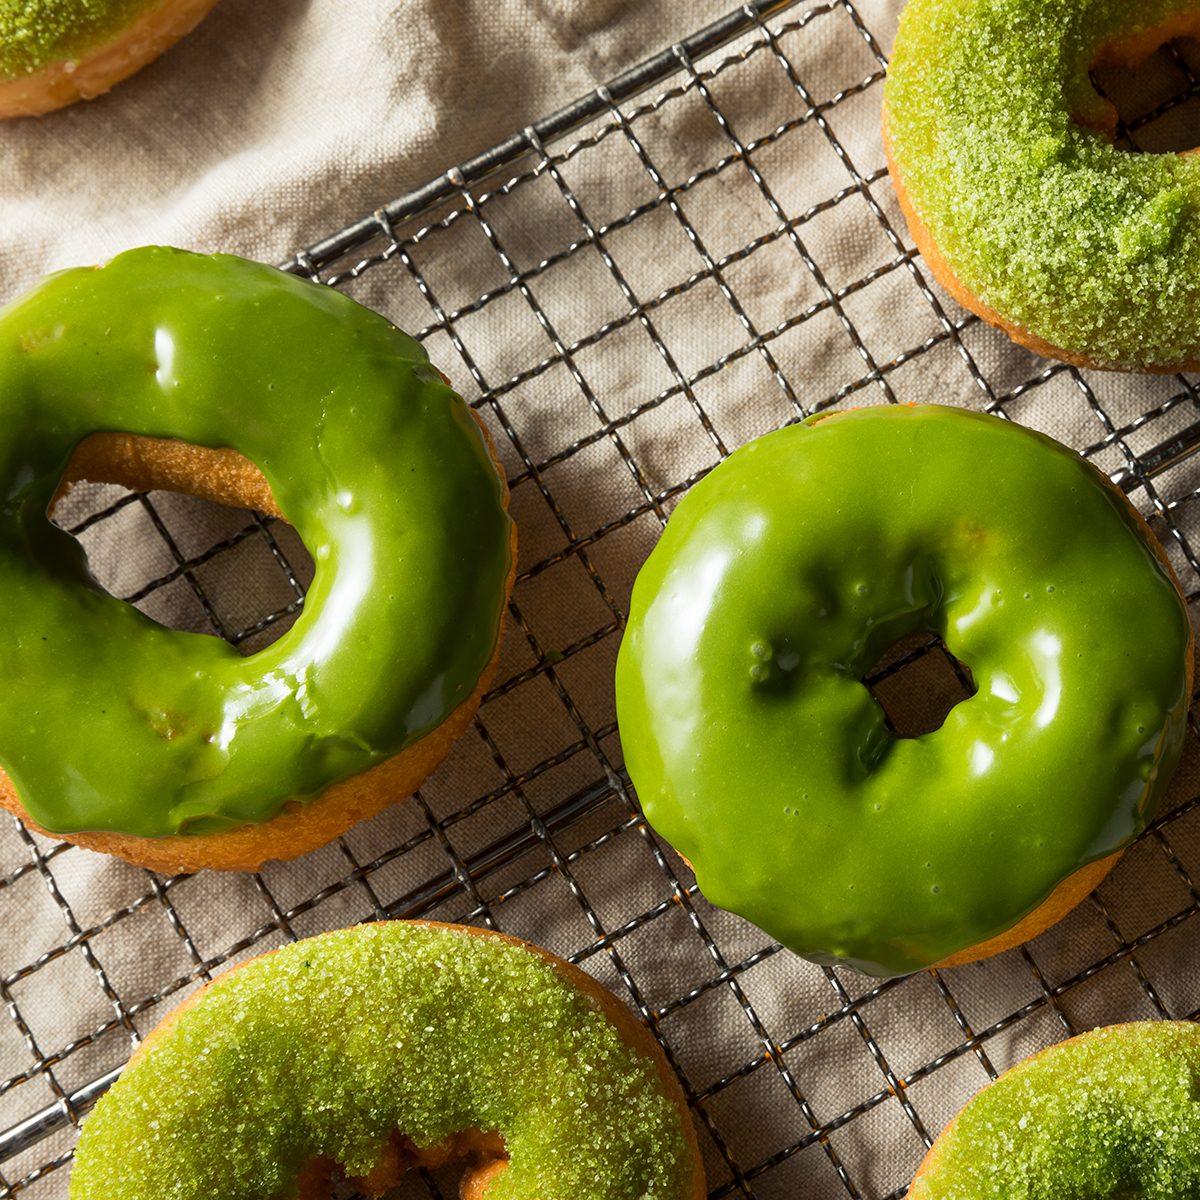 Homemade Green Tea Matcha Donuts Ready to Eat